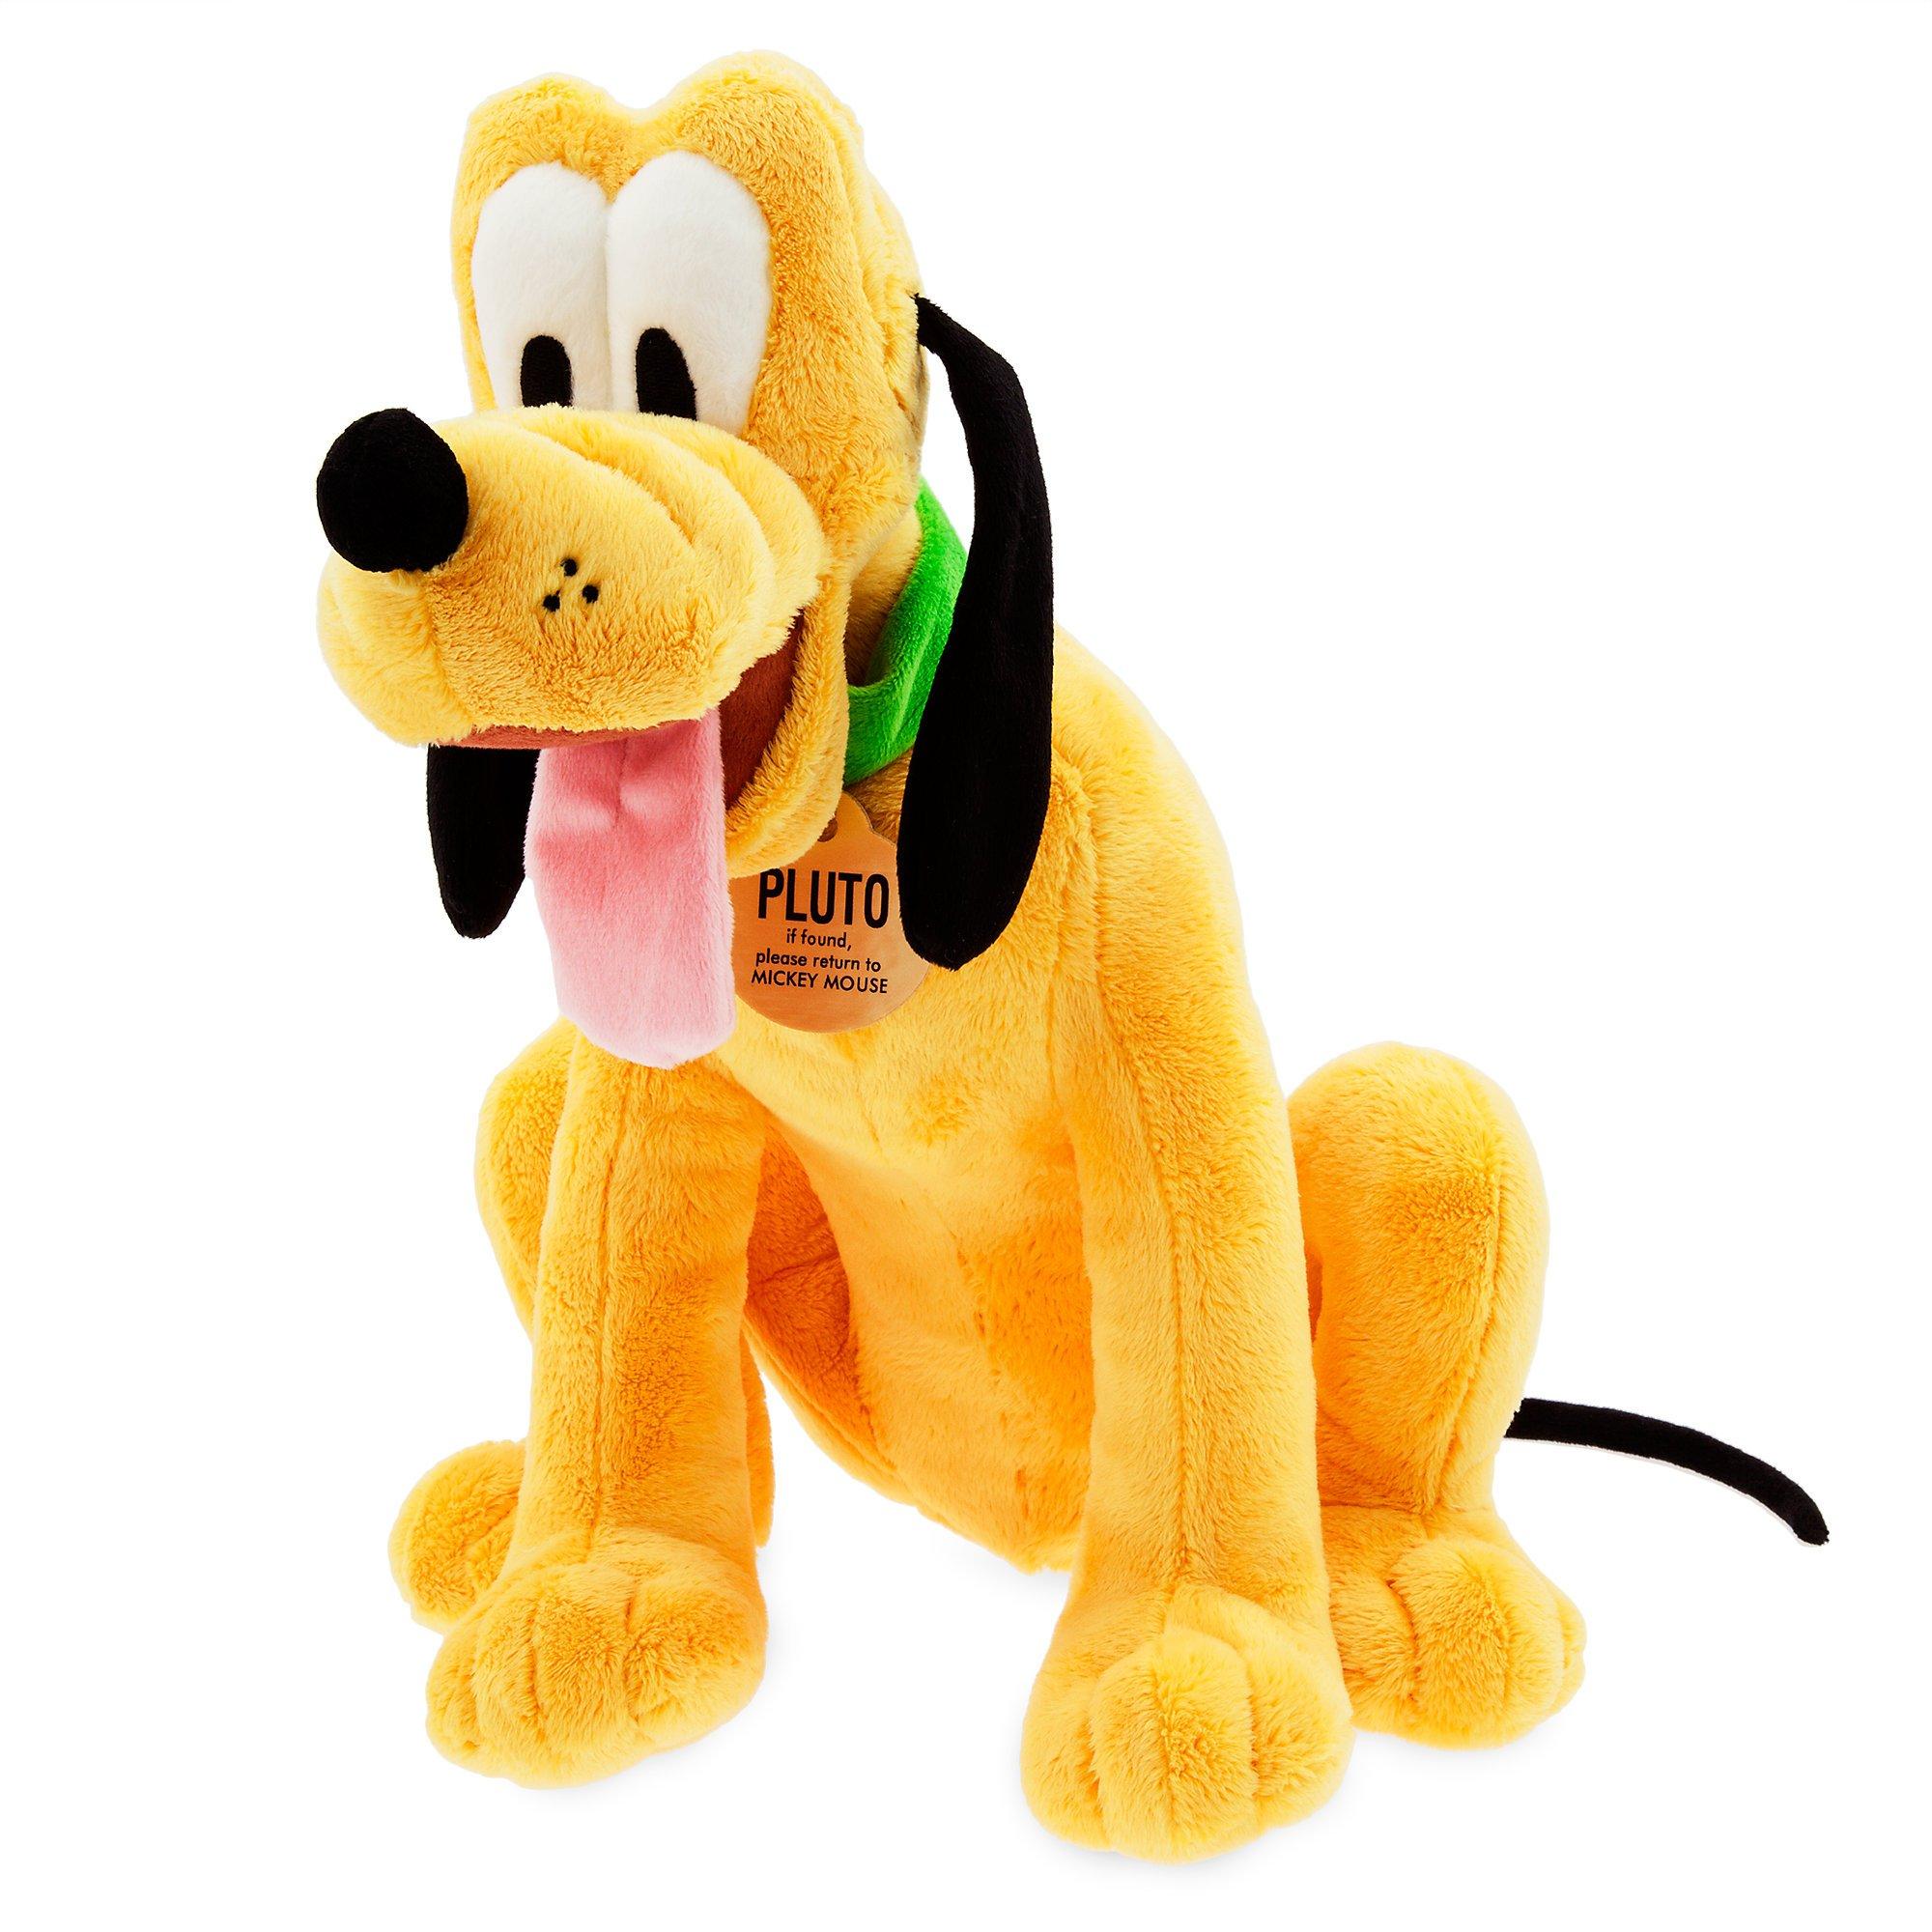 Disney Pluto Plush - Medium - 15 1/2 inch